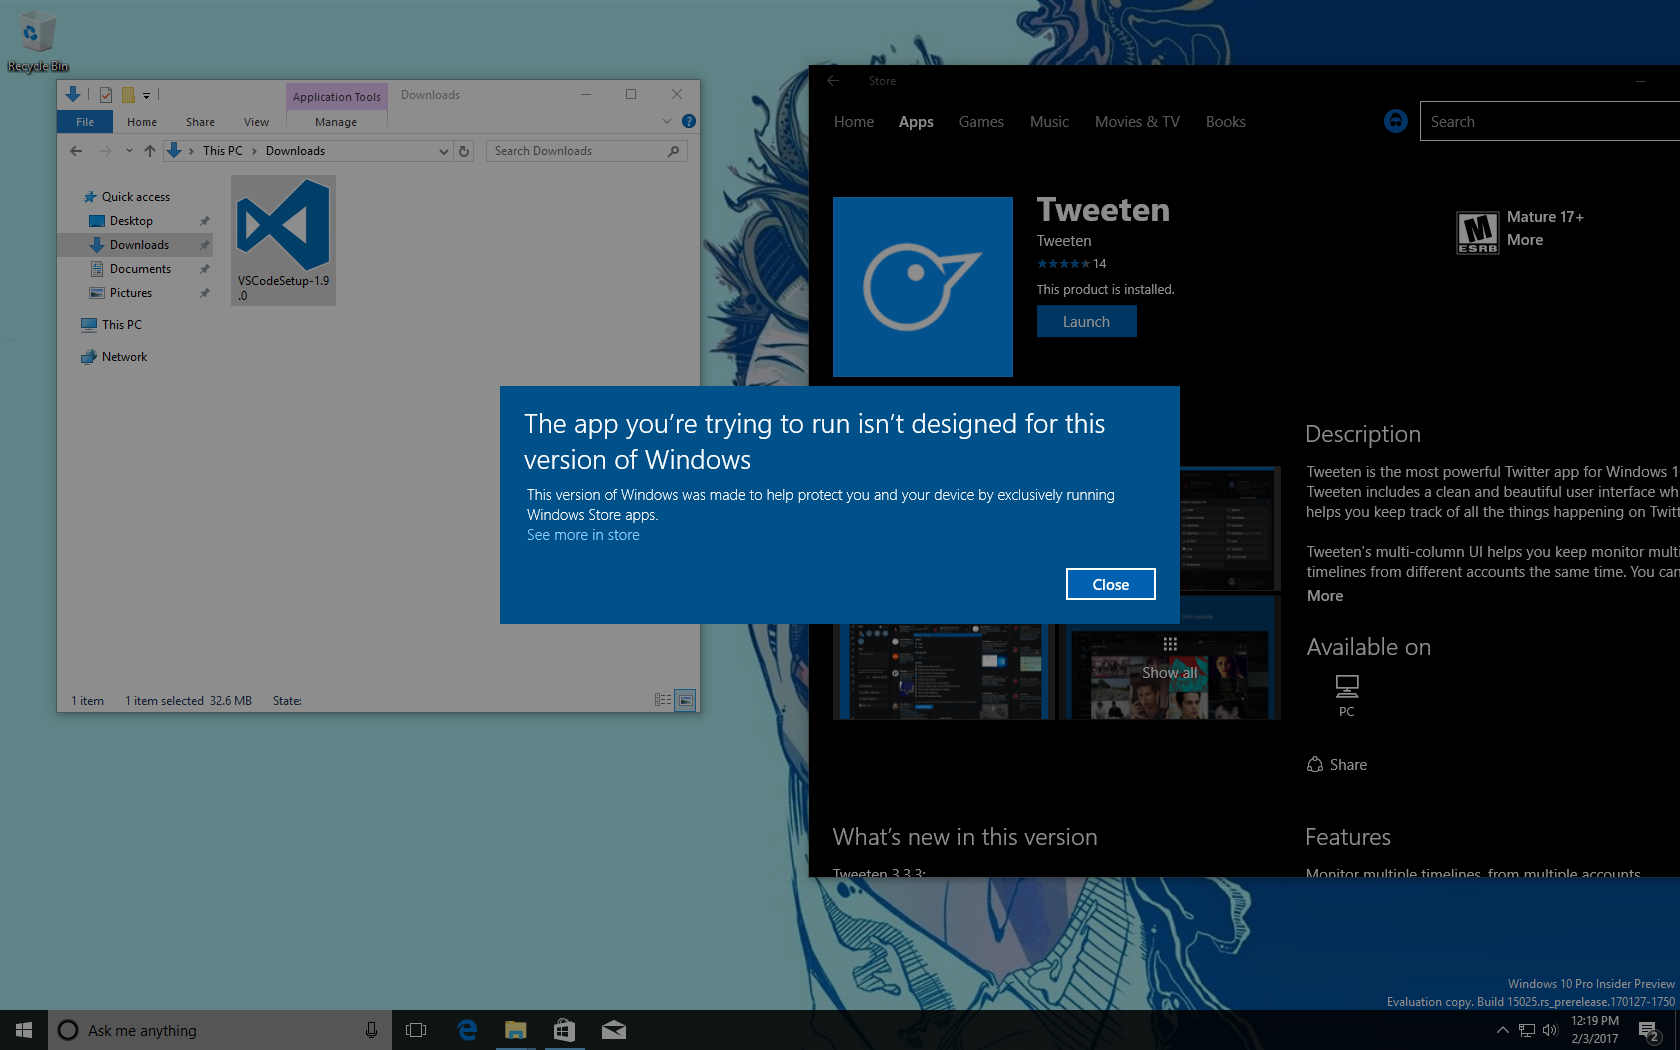 Early version of Windows 10 Cloud leaks (screenshots) 3